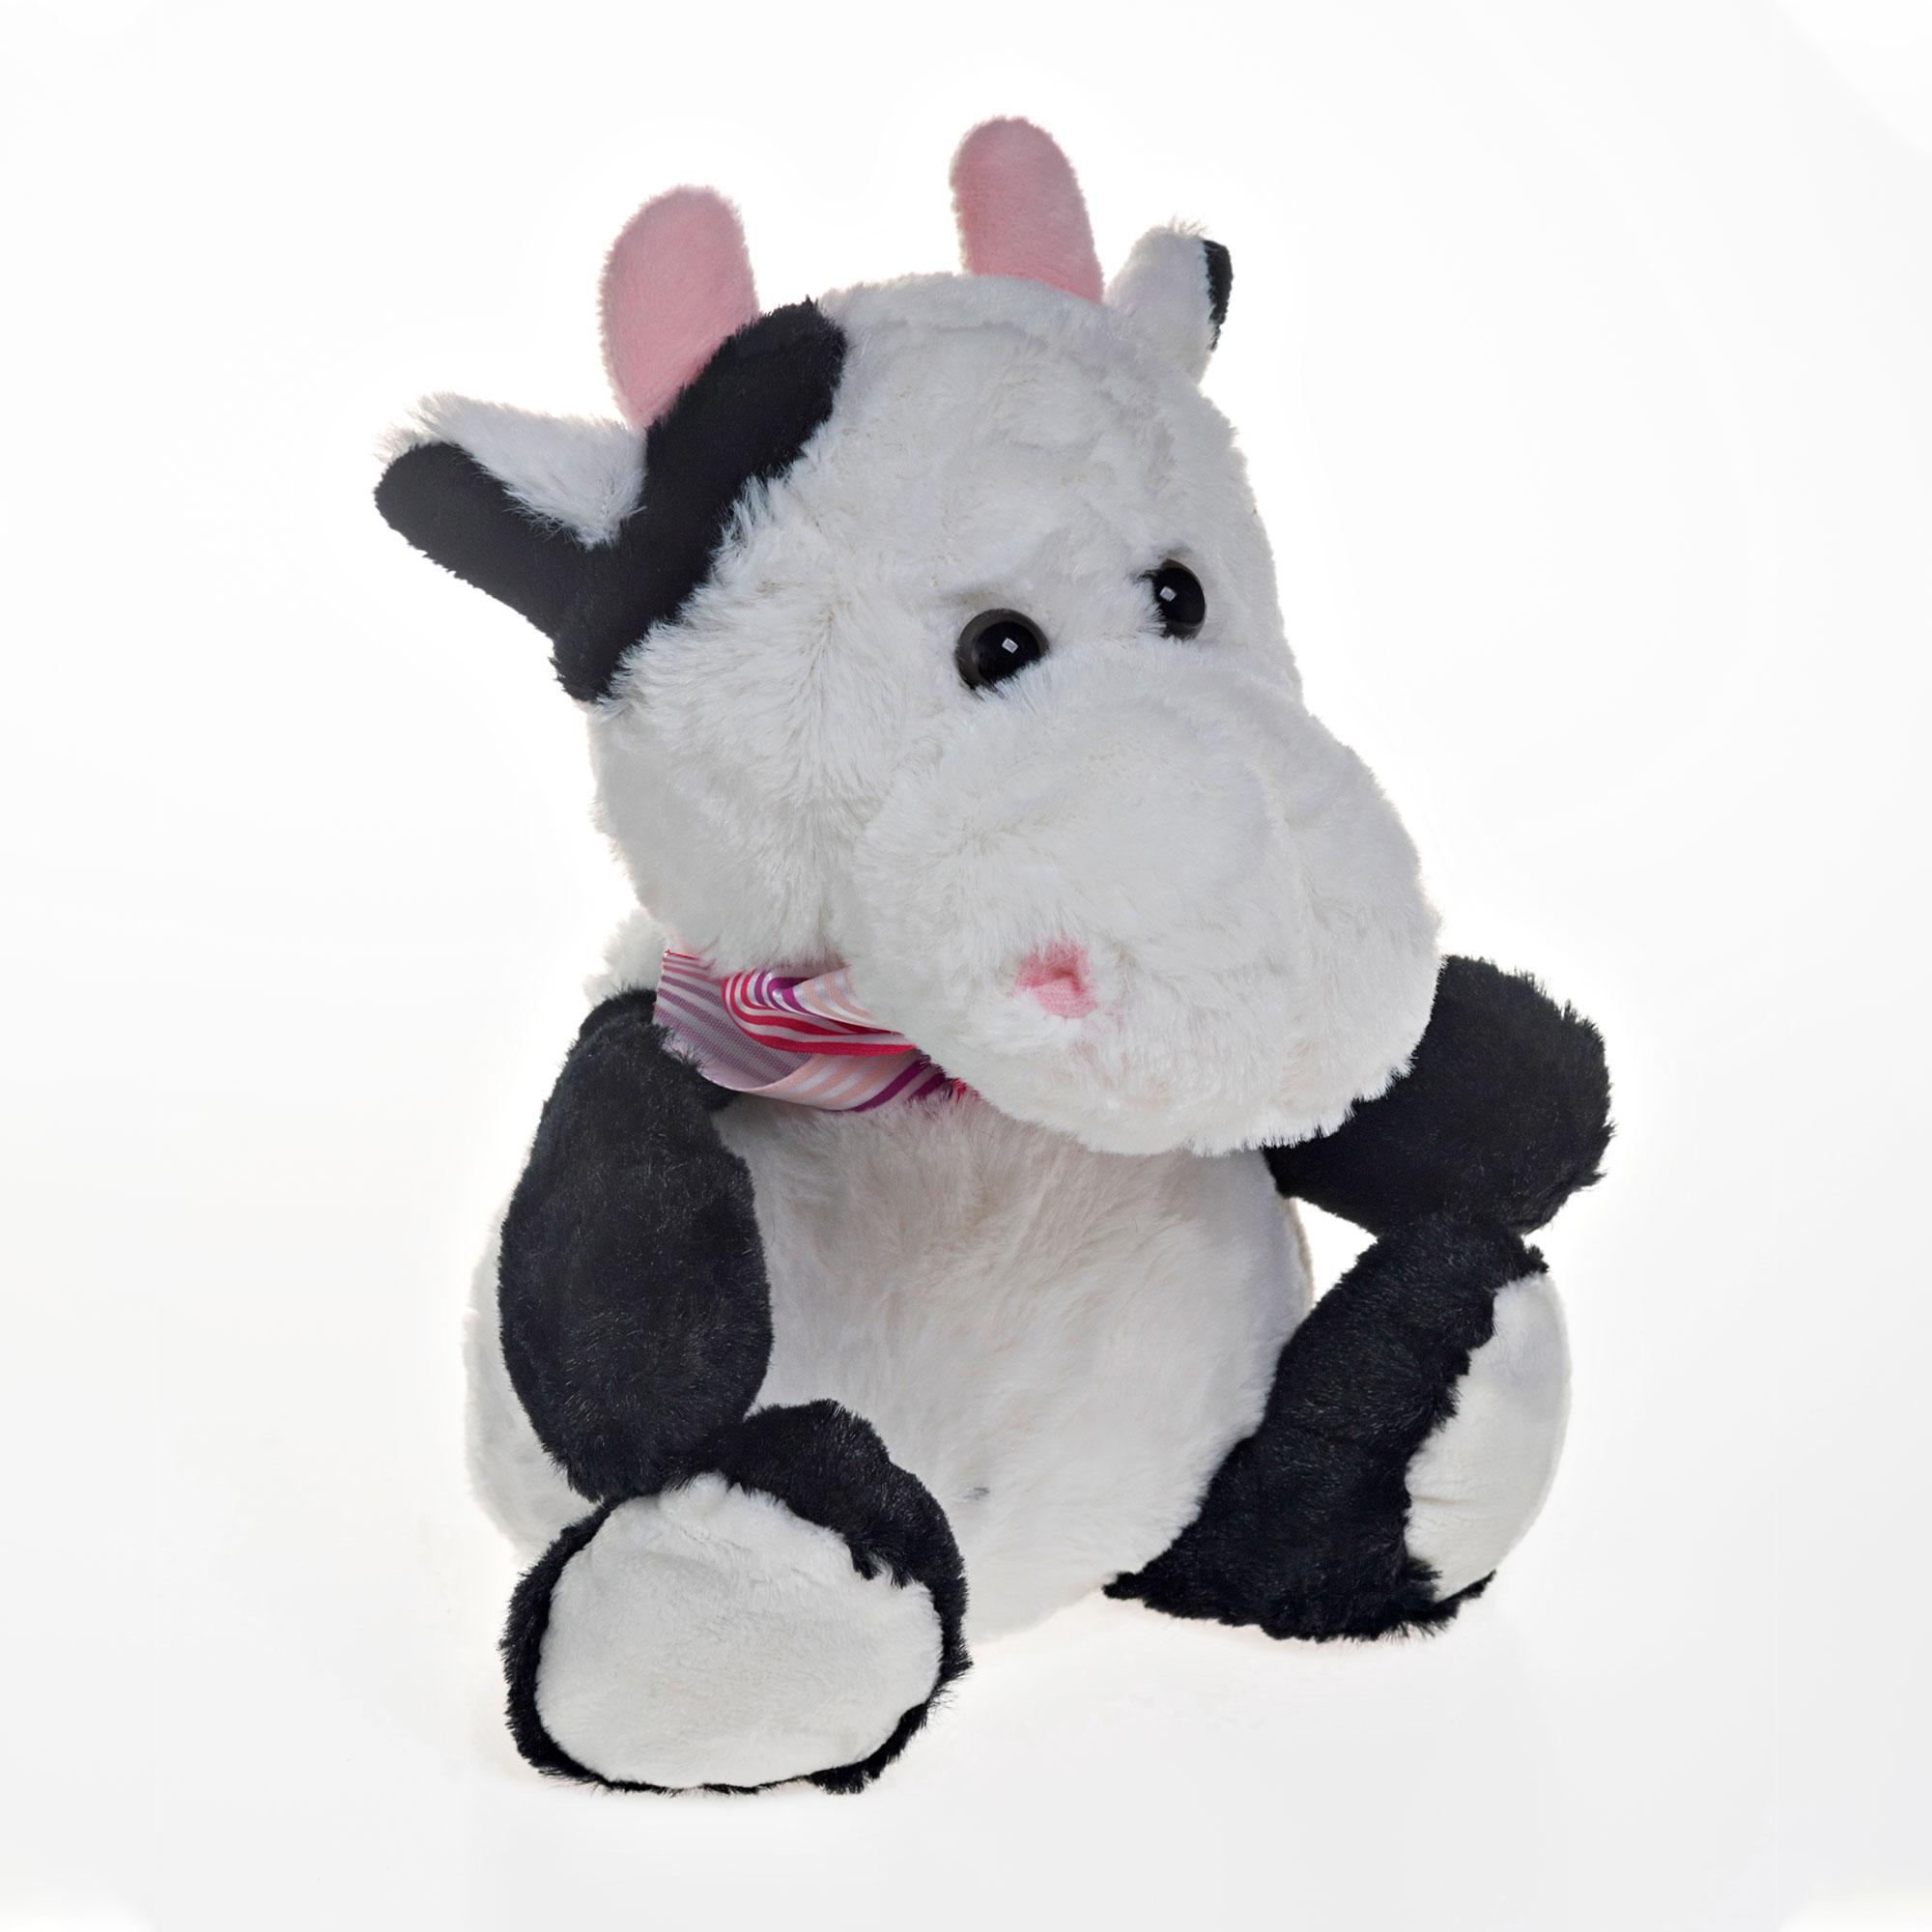 Vaca de Pelúcia 19cm Sentado